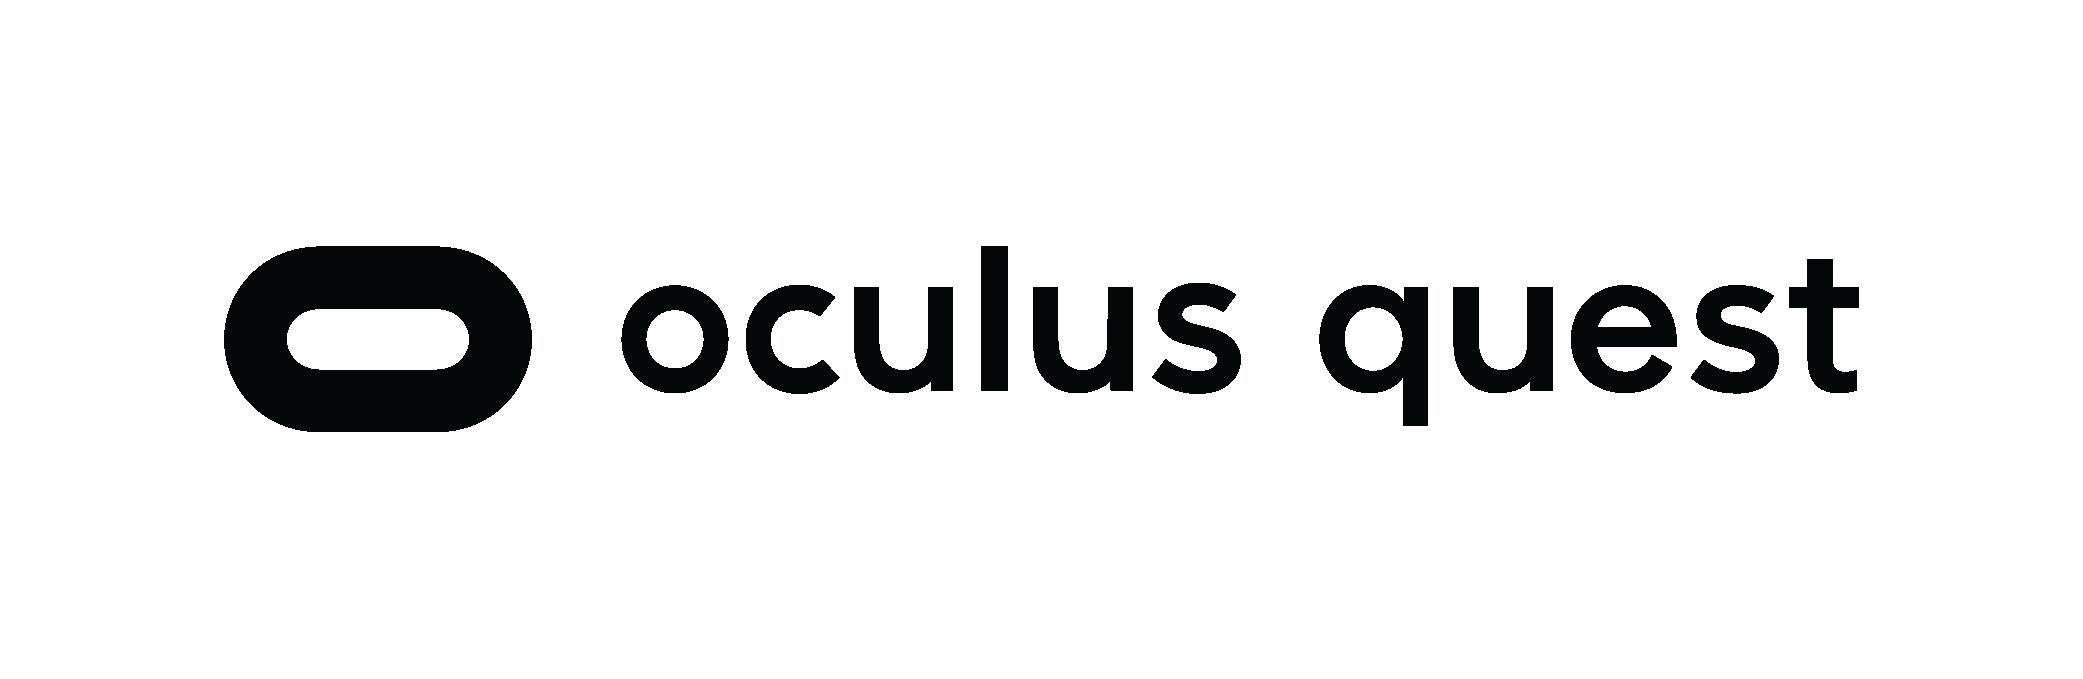 OCULUS_QUEST_Black-01.png